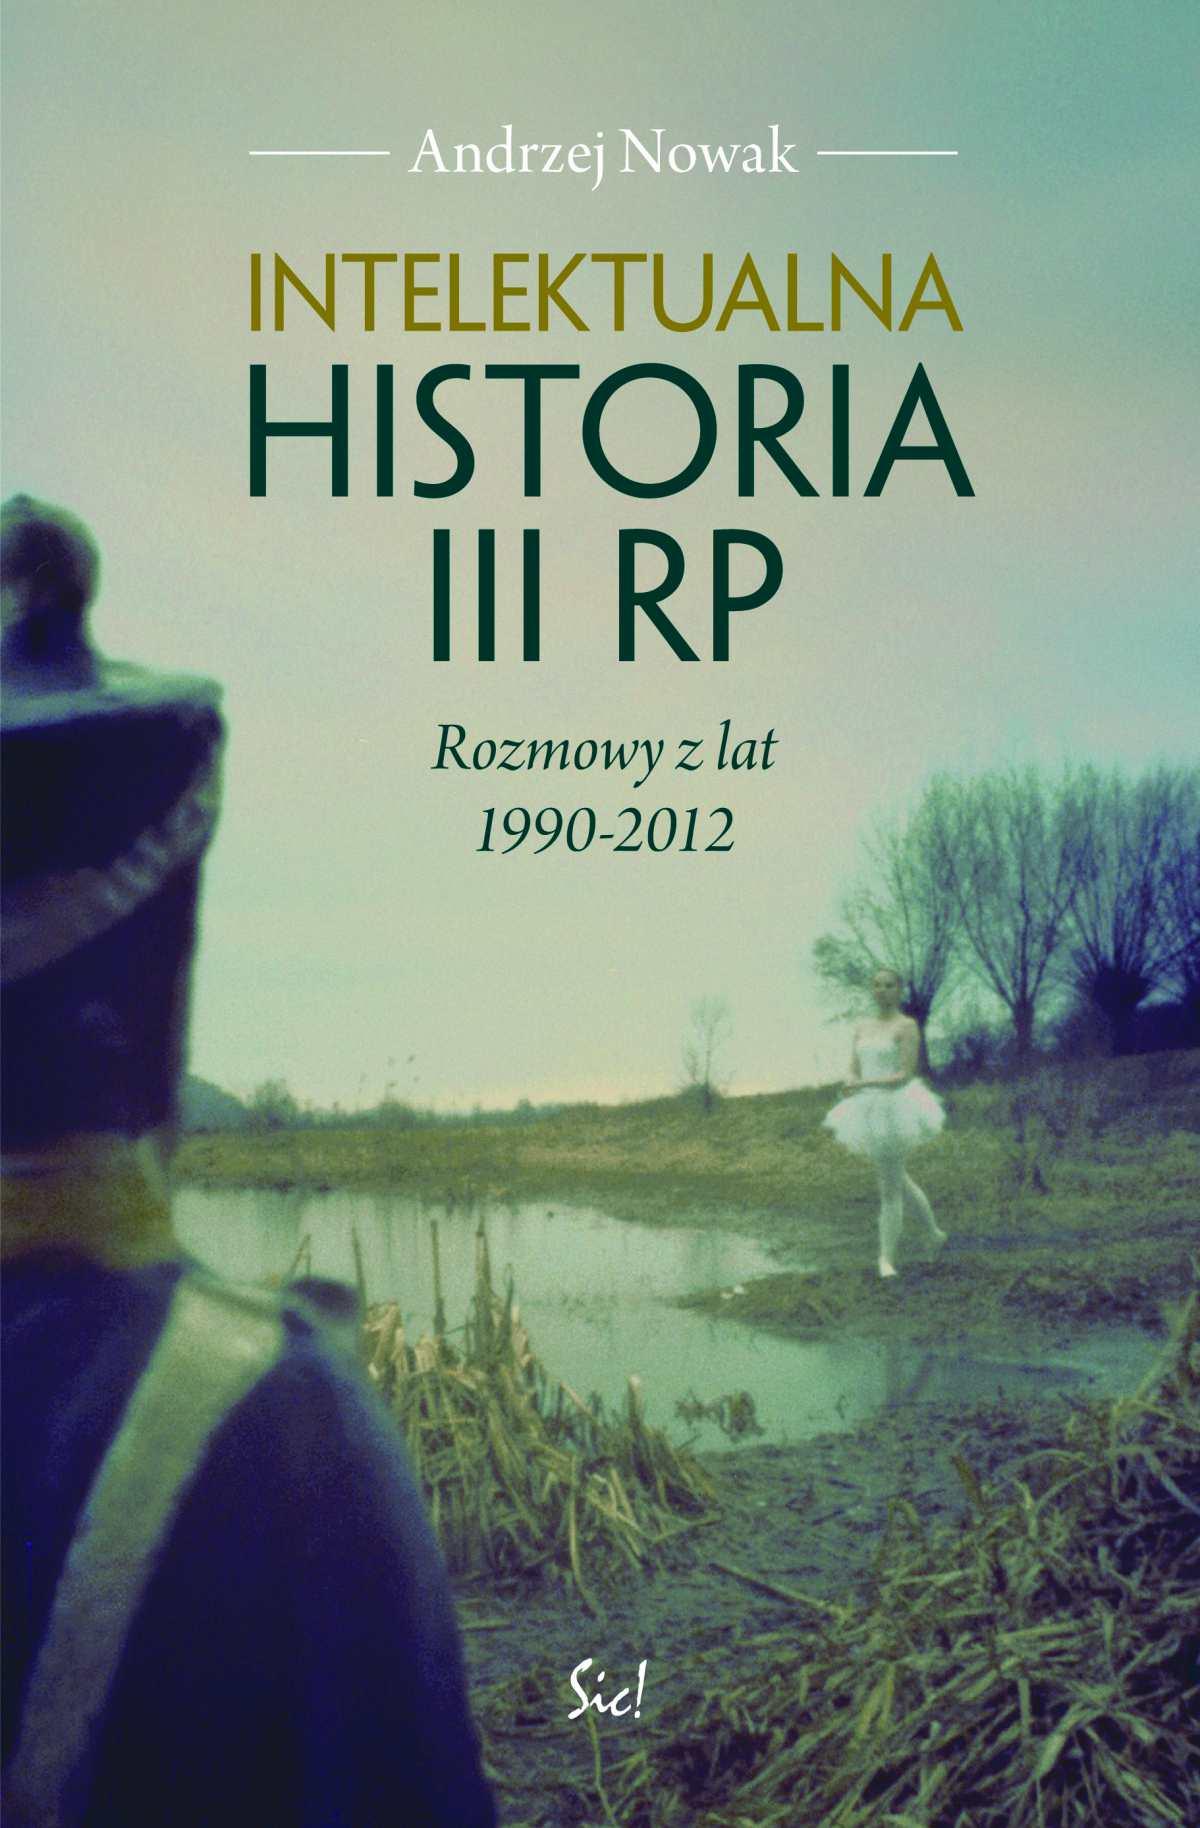 Intelektualna historia III RP - Ebook (Książka na Kindle) do pobrania w formacie MOBI